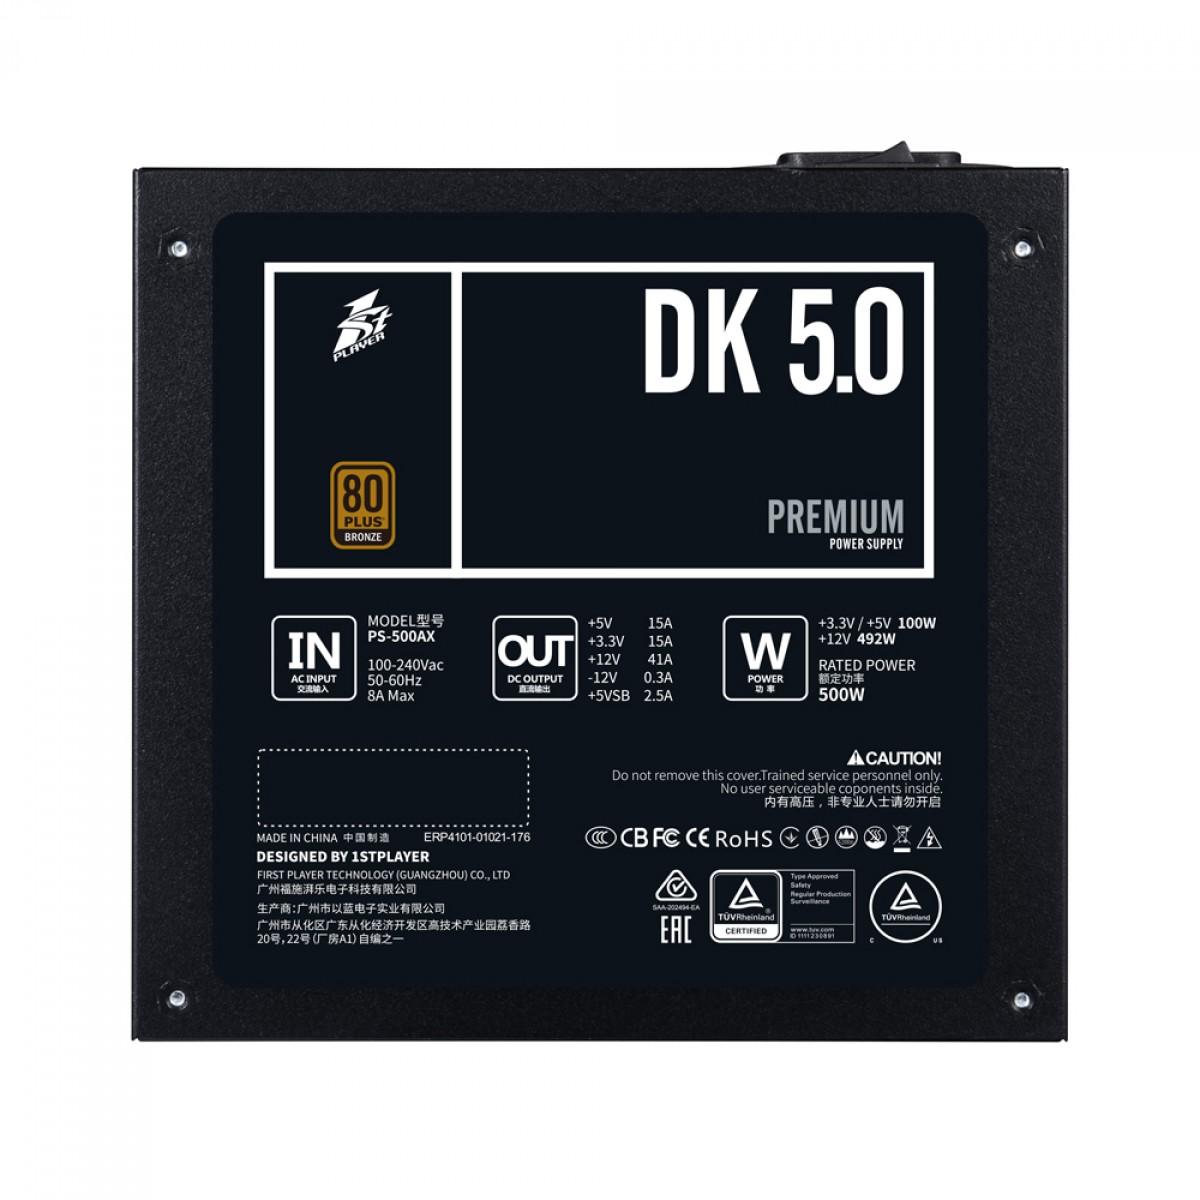 Fonte FirstPlayer DK PREMIUM 5.0, 500W, 80 Plus Bronze, PFC Ativo, PS-500AX